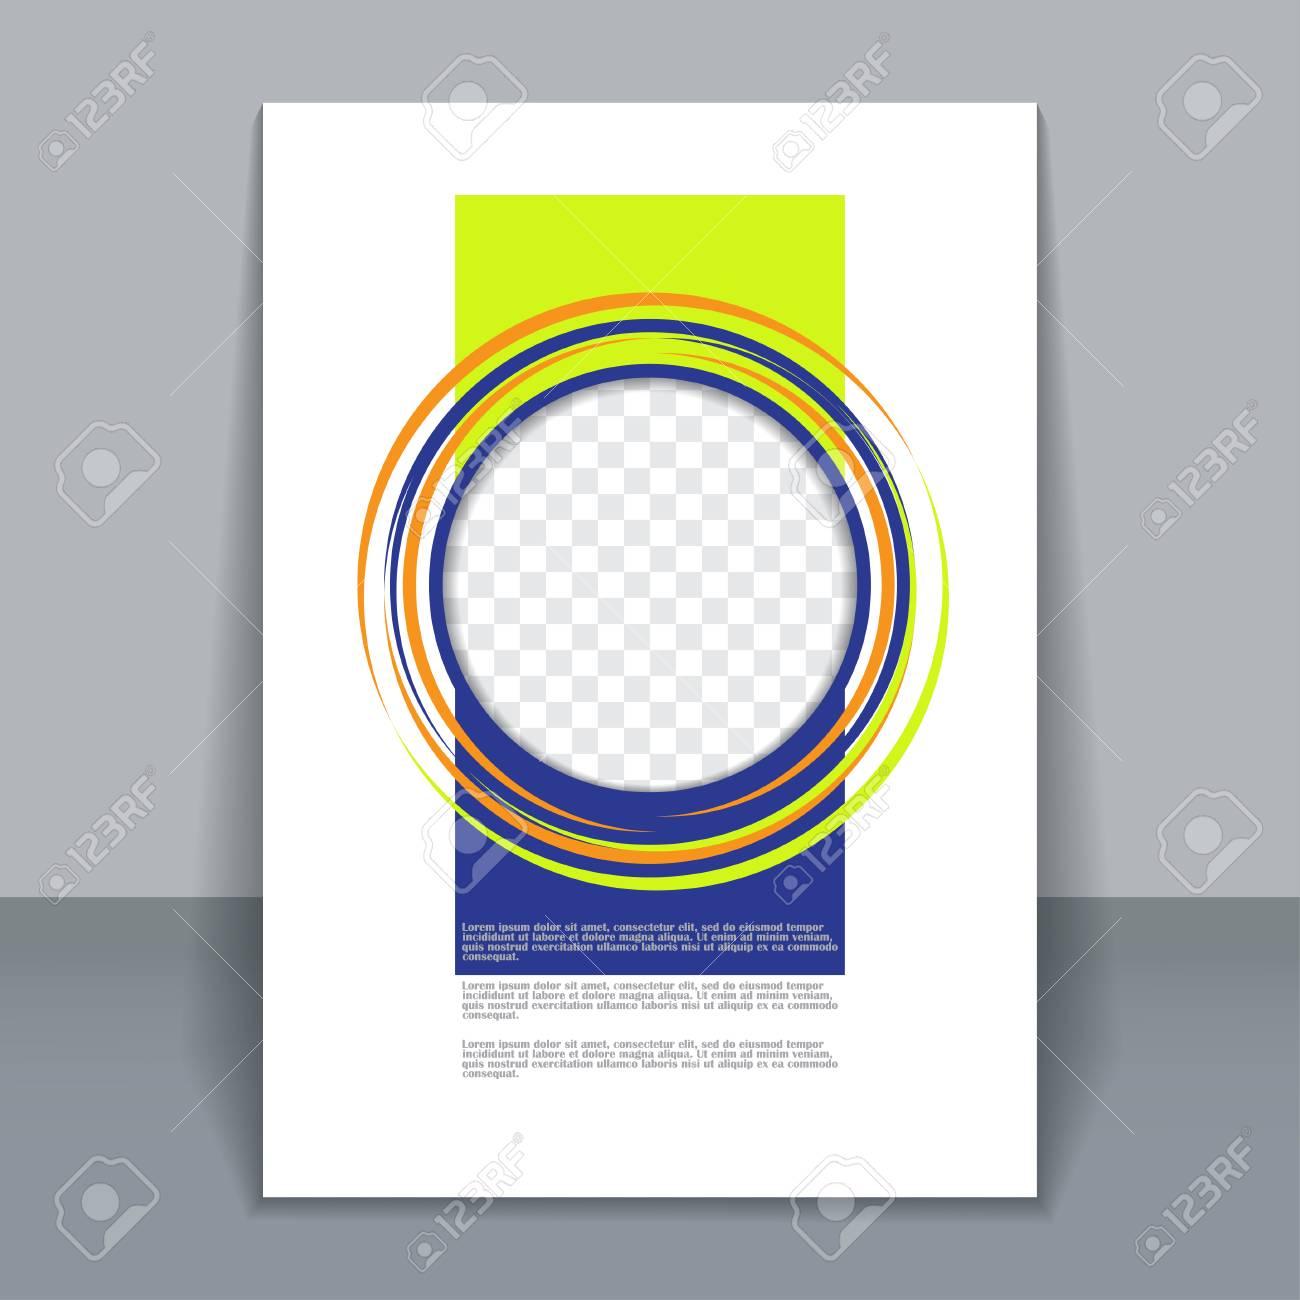 vector vertical flyer template for design editable a4 poster